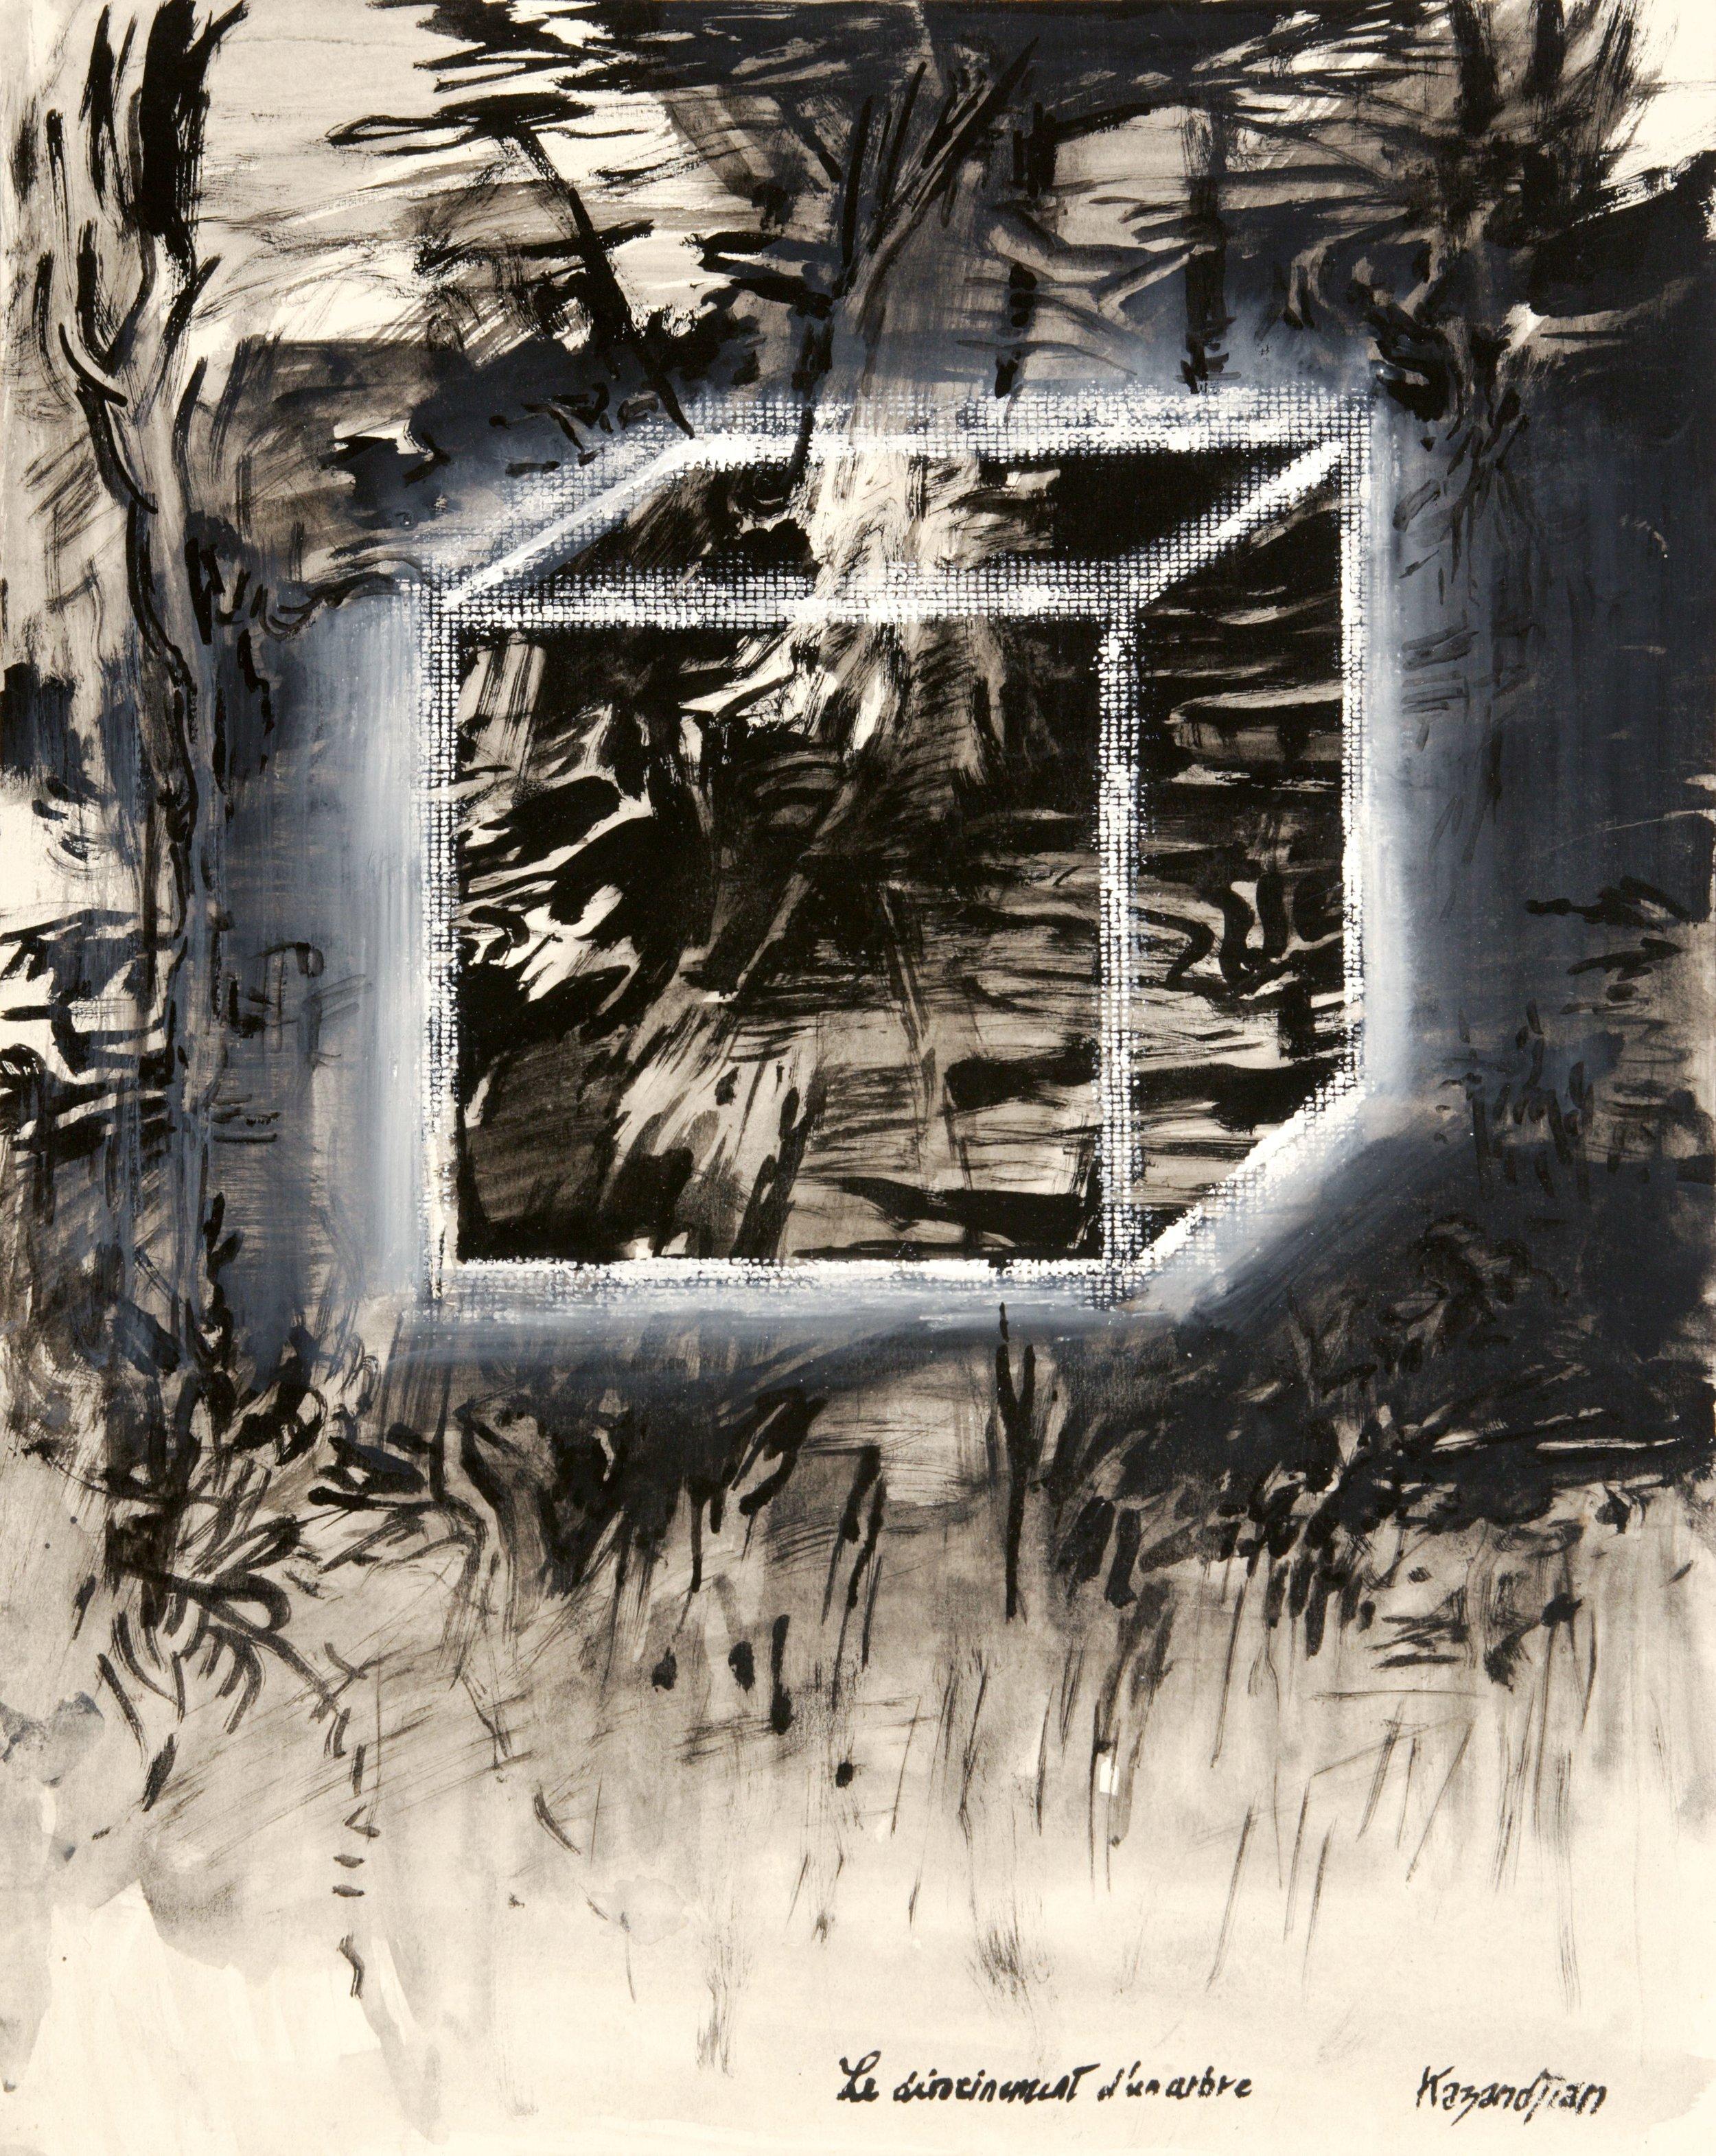 Untitled - 1996